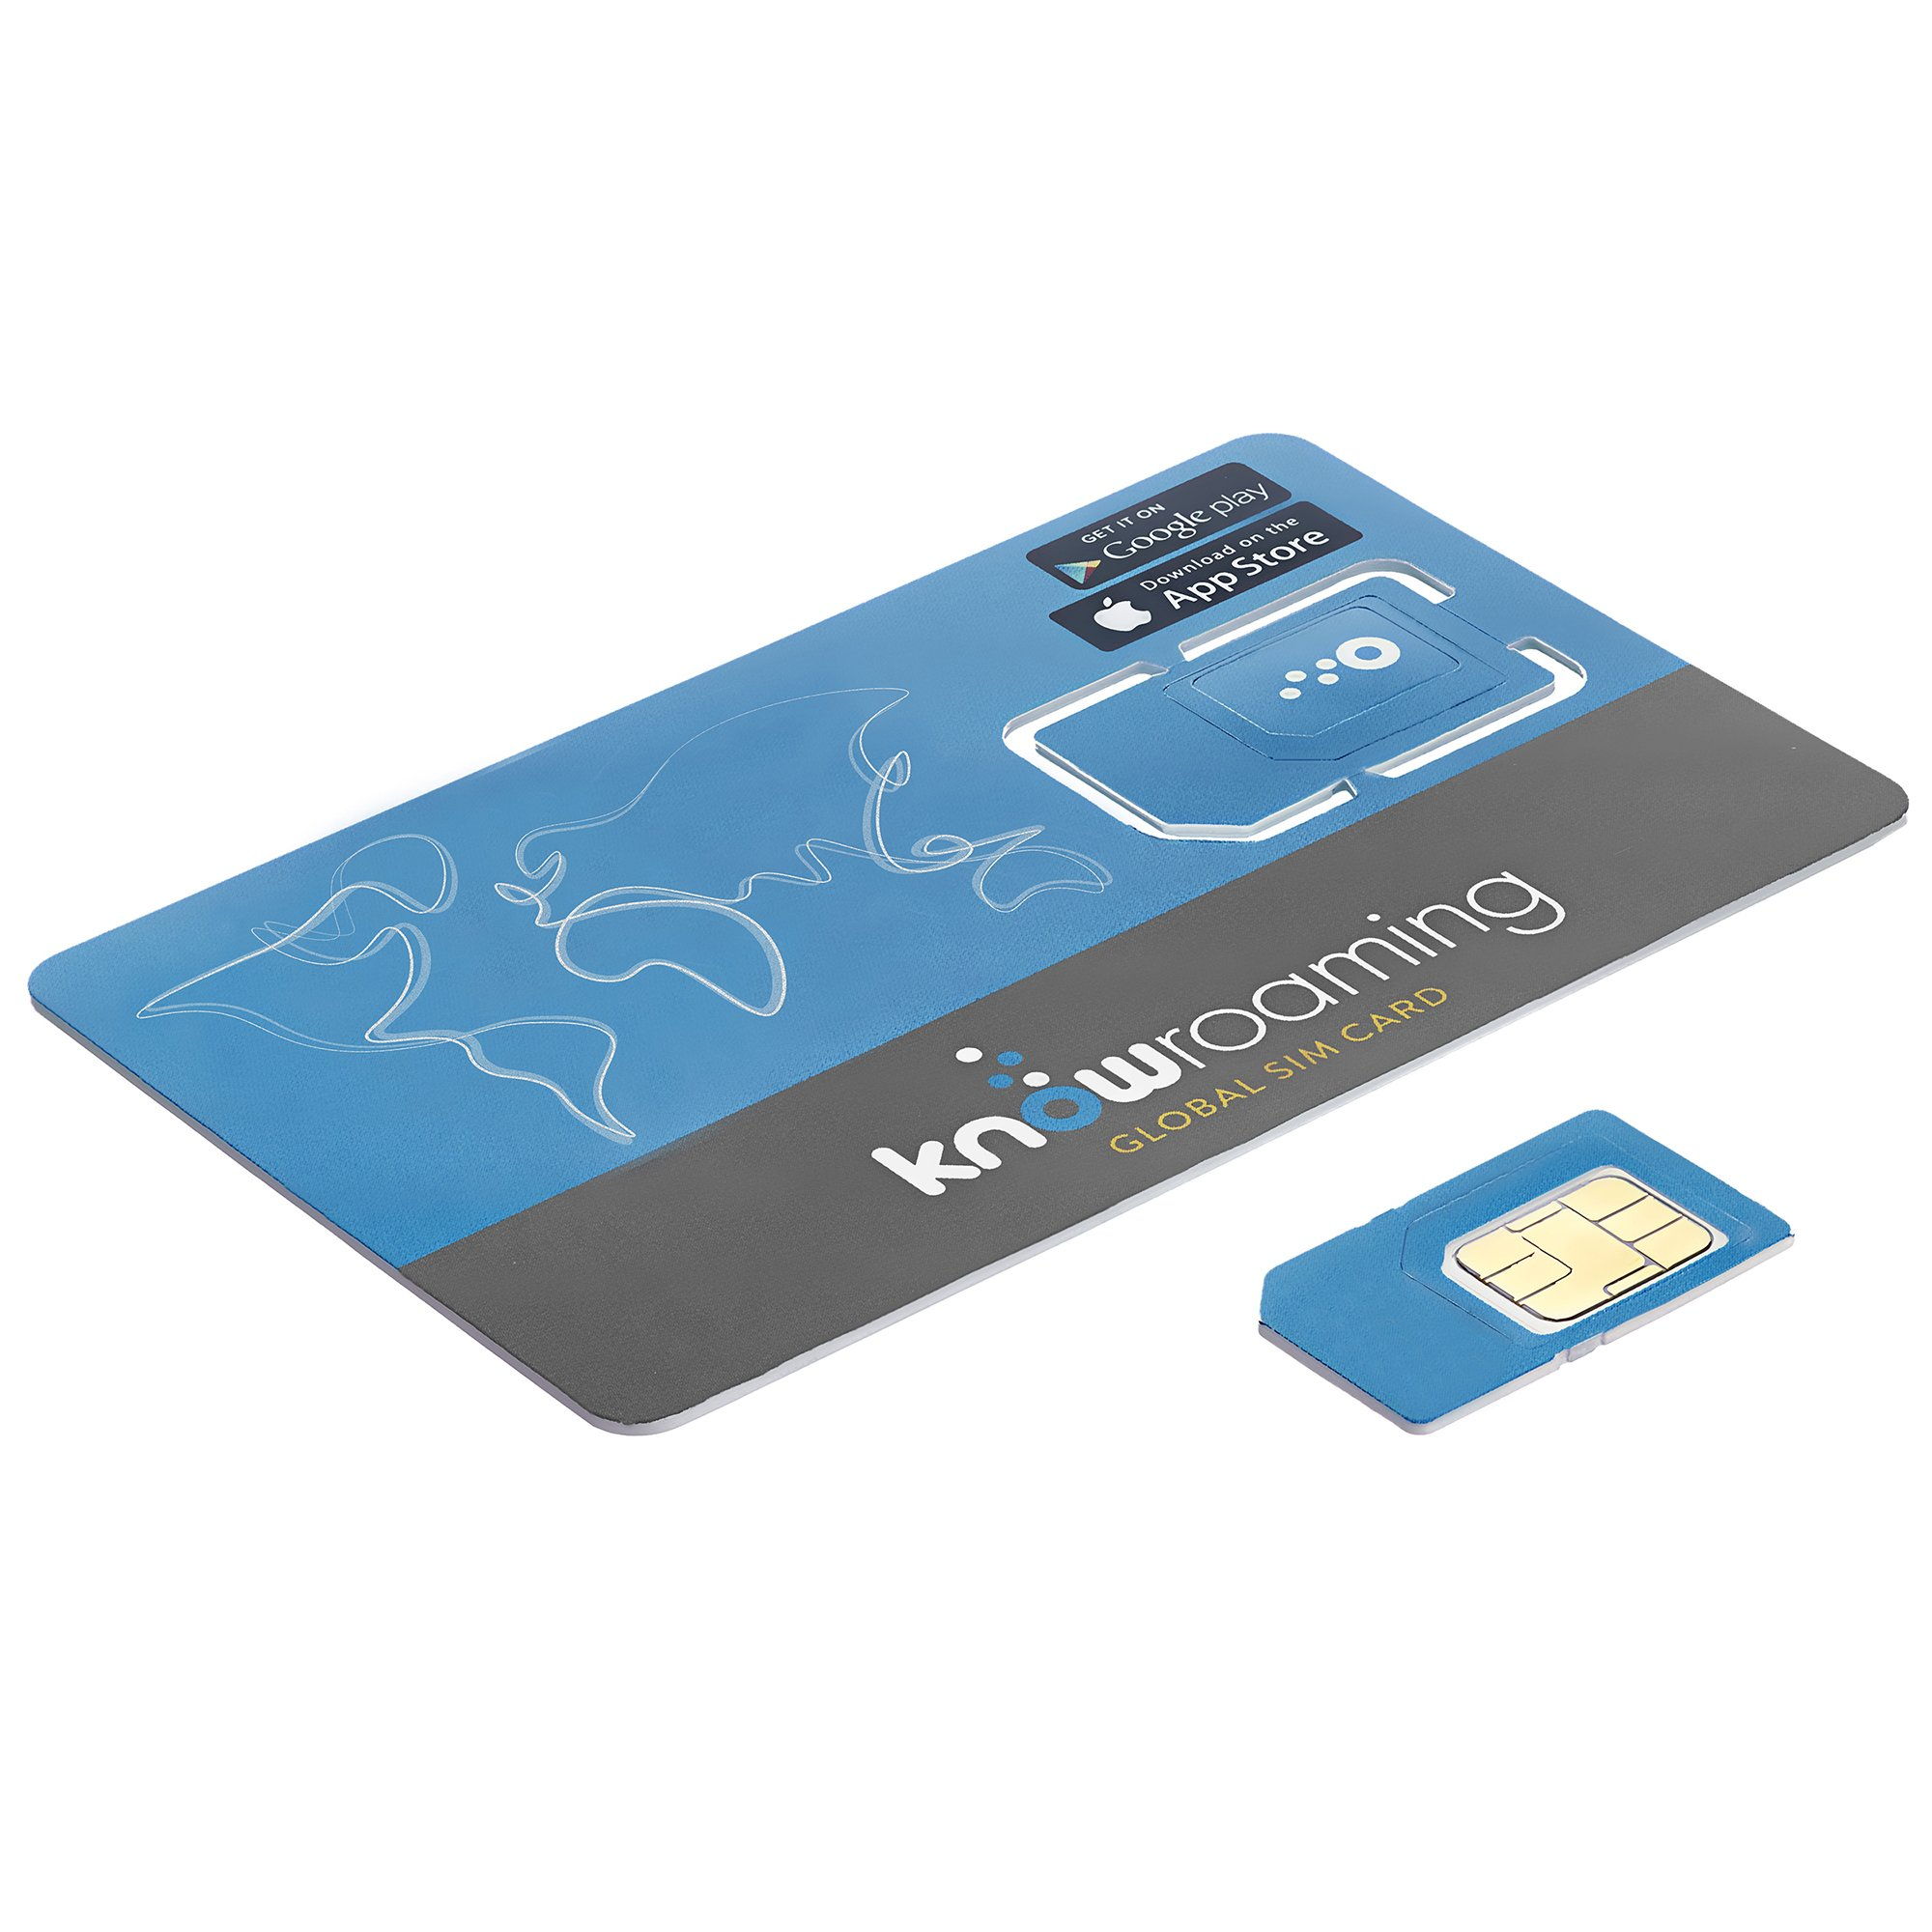 knowroaming global travel sim card - Global Travel Card